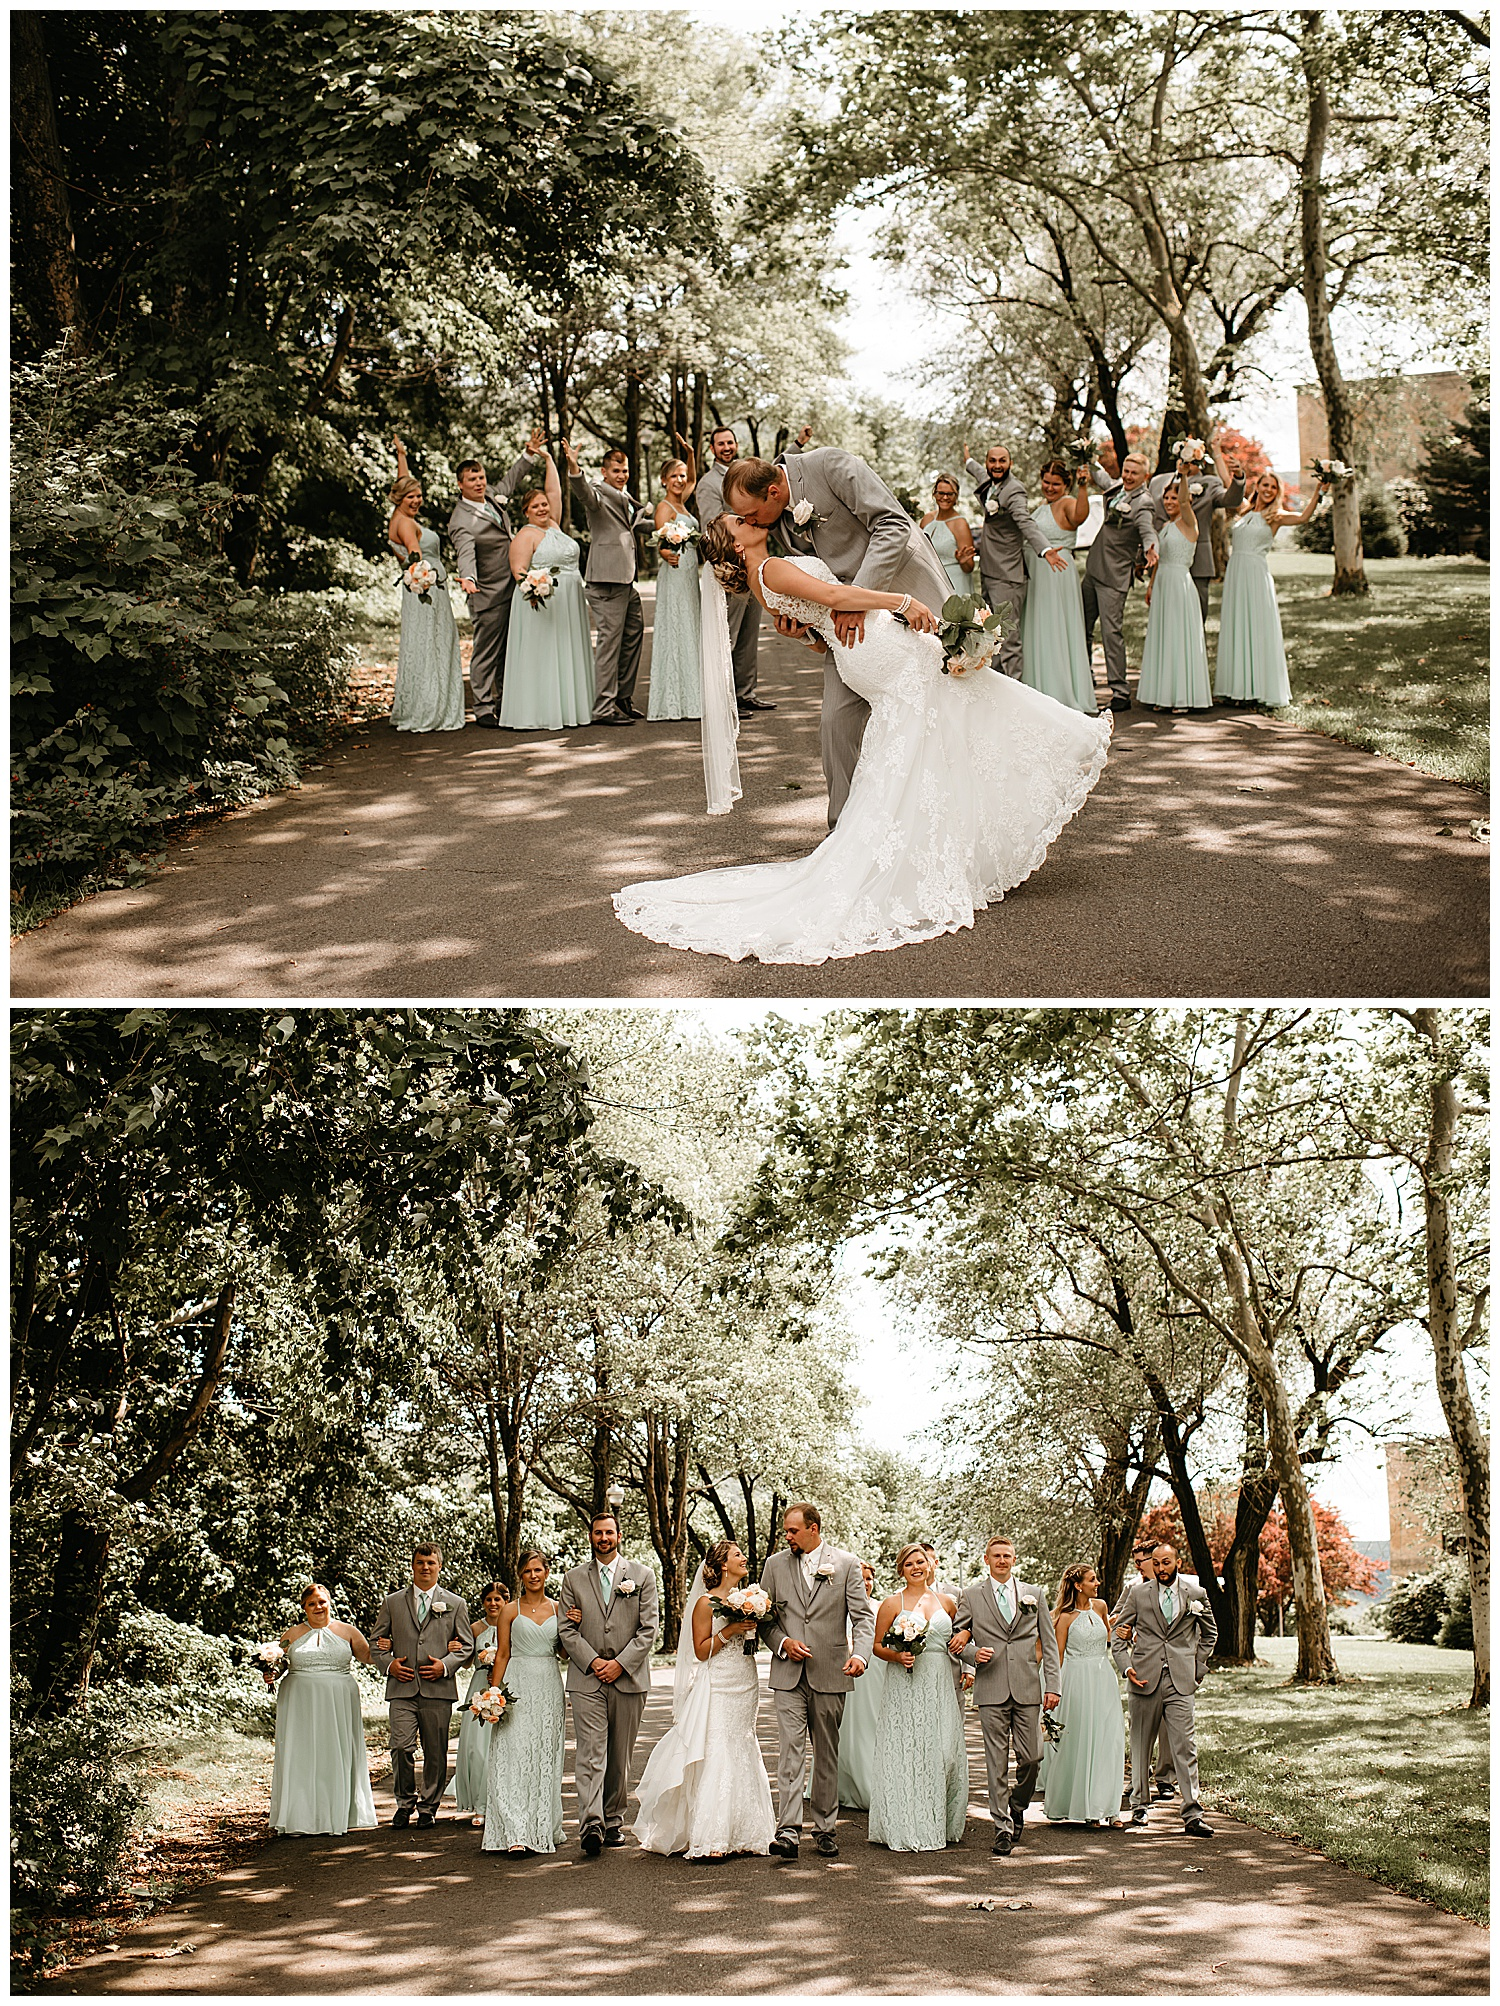 NEPA-Lehigh-Valley-Wedding-Photographer-at-Fountain-Springs-Country-Inn-Ashland-PA_0032.jpg